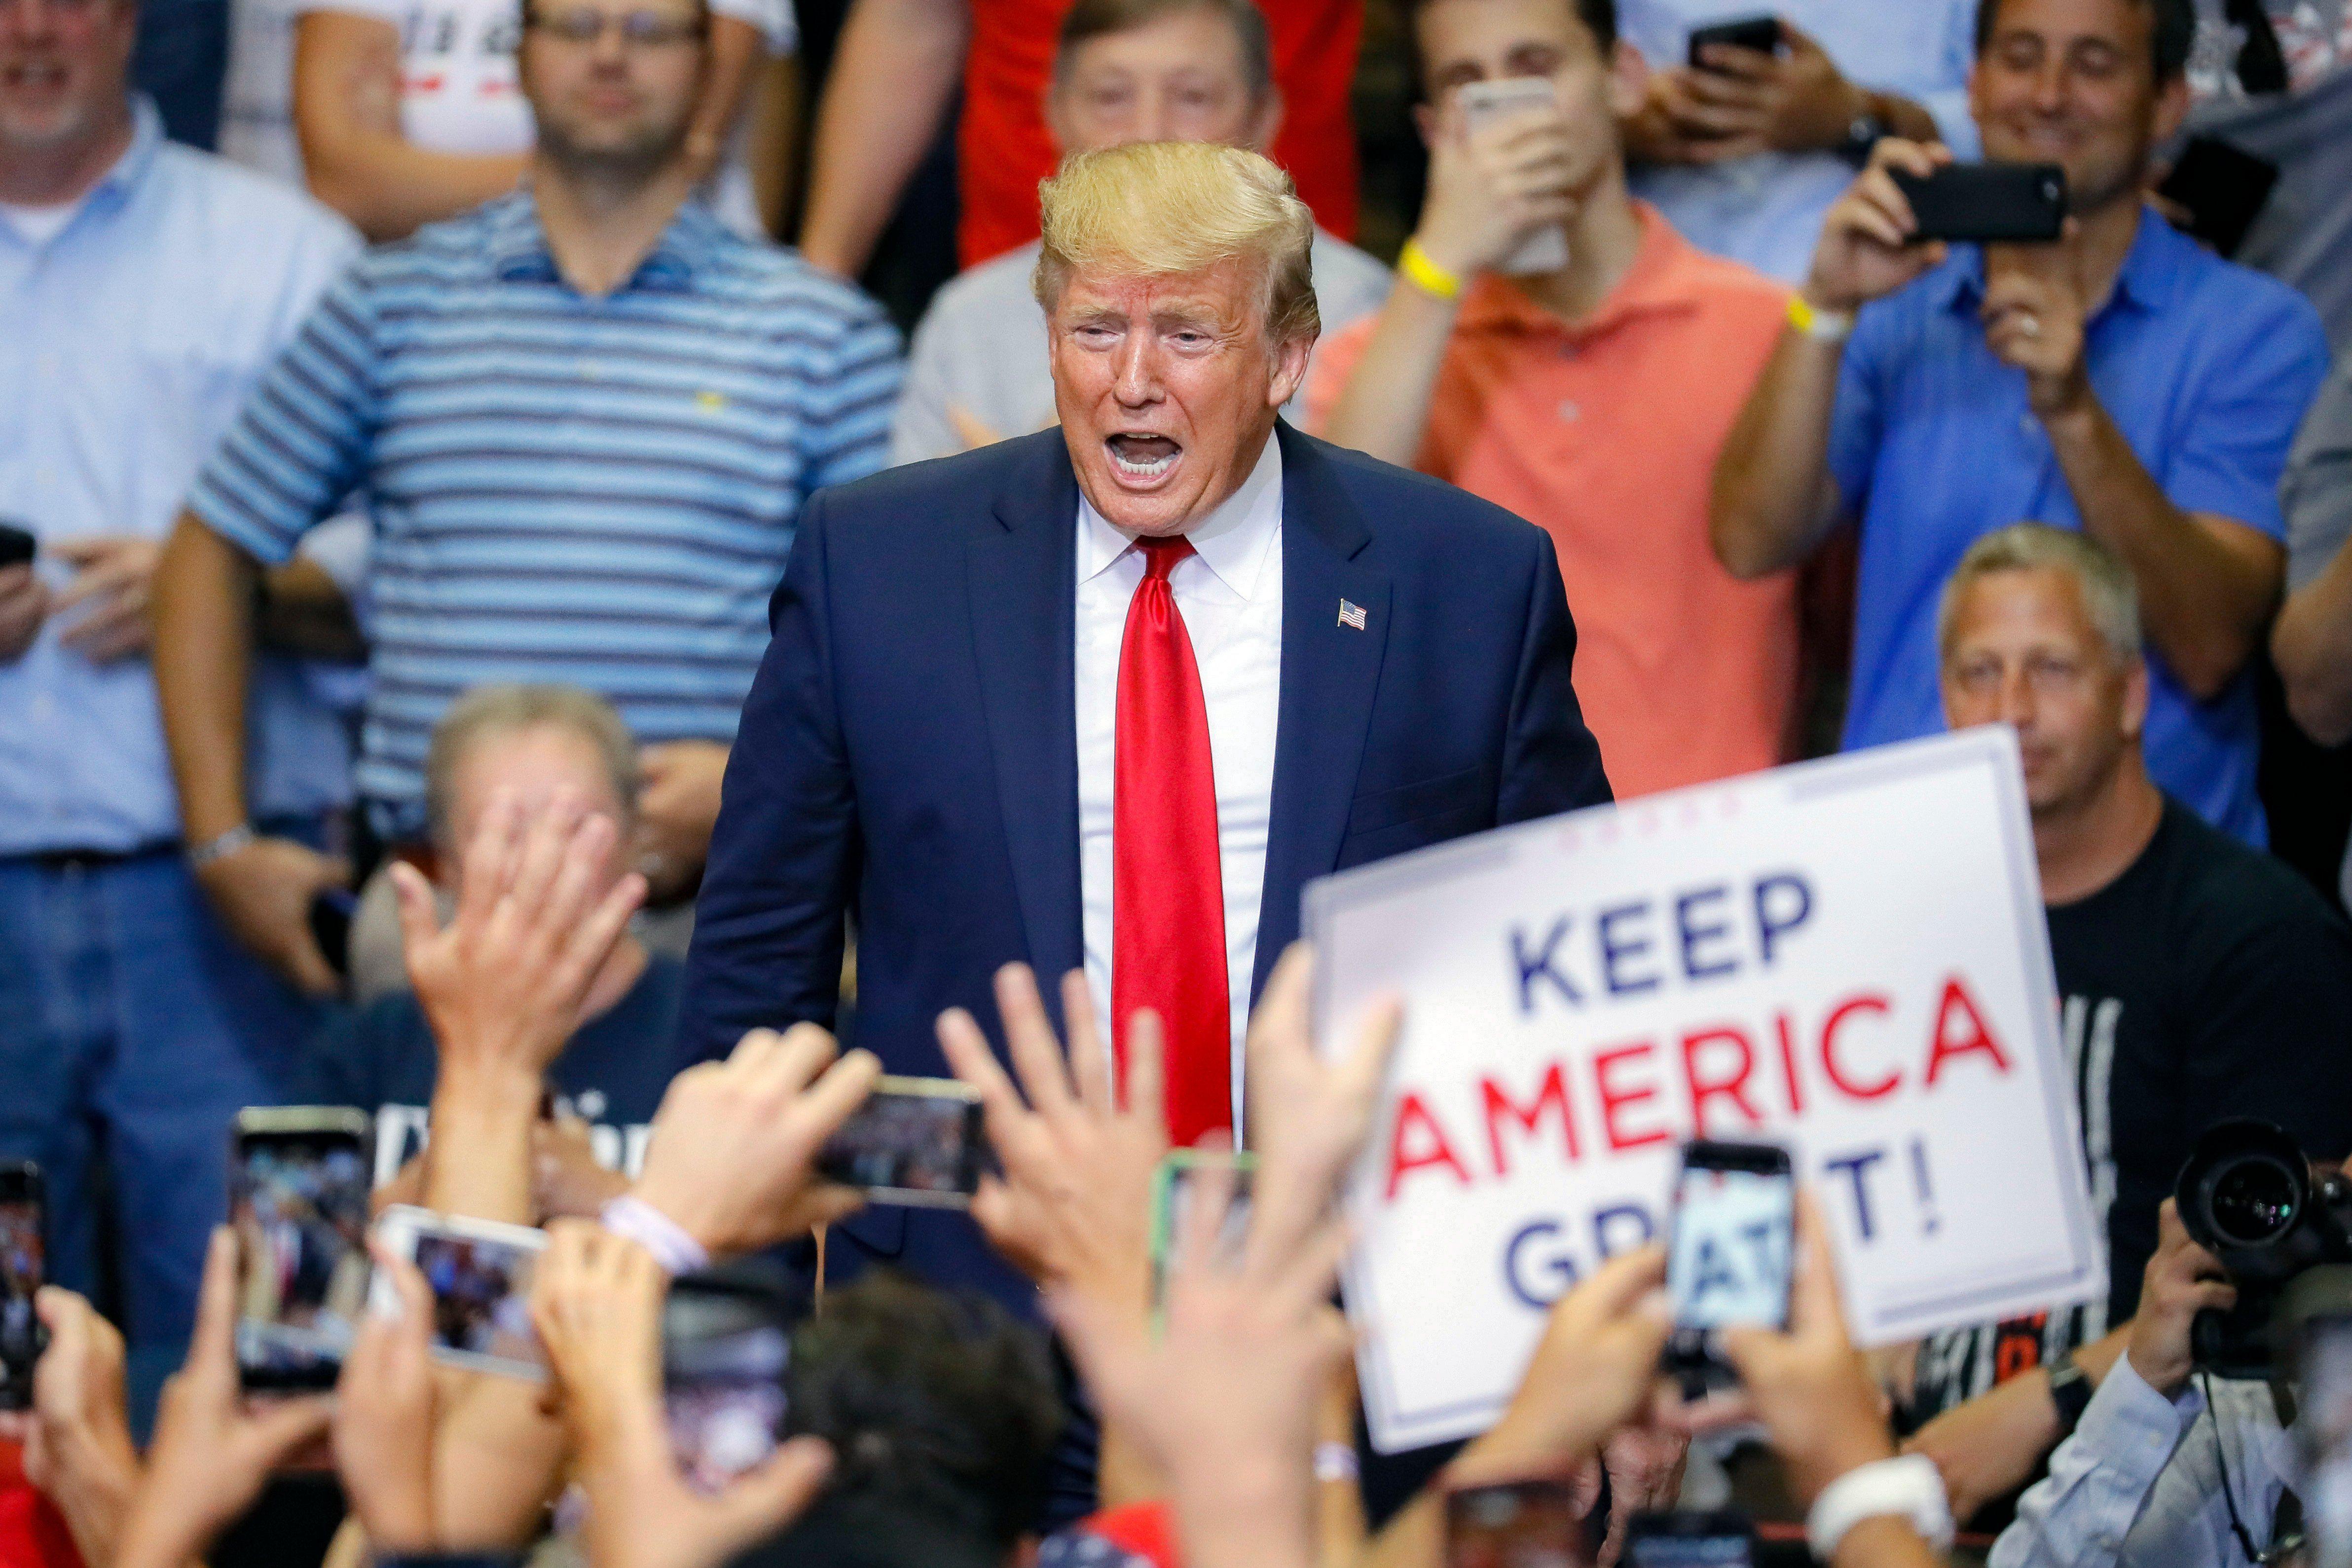 President Donald Trump arrives at a campaign rally at U.S. Bank Arena, Thursday, Aug. 1, 2019, in Cincinnati. (AP Photo/John Minchillo)